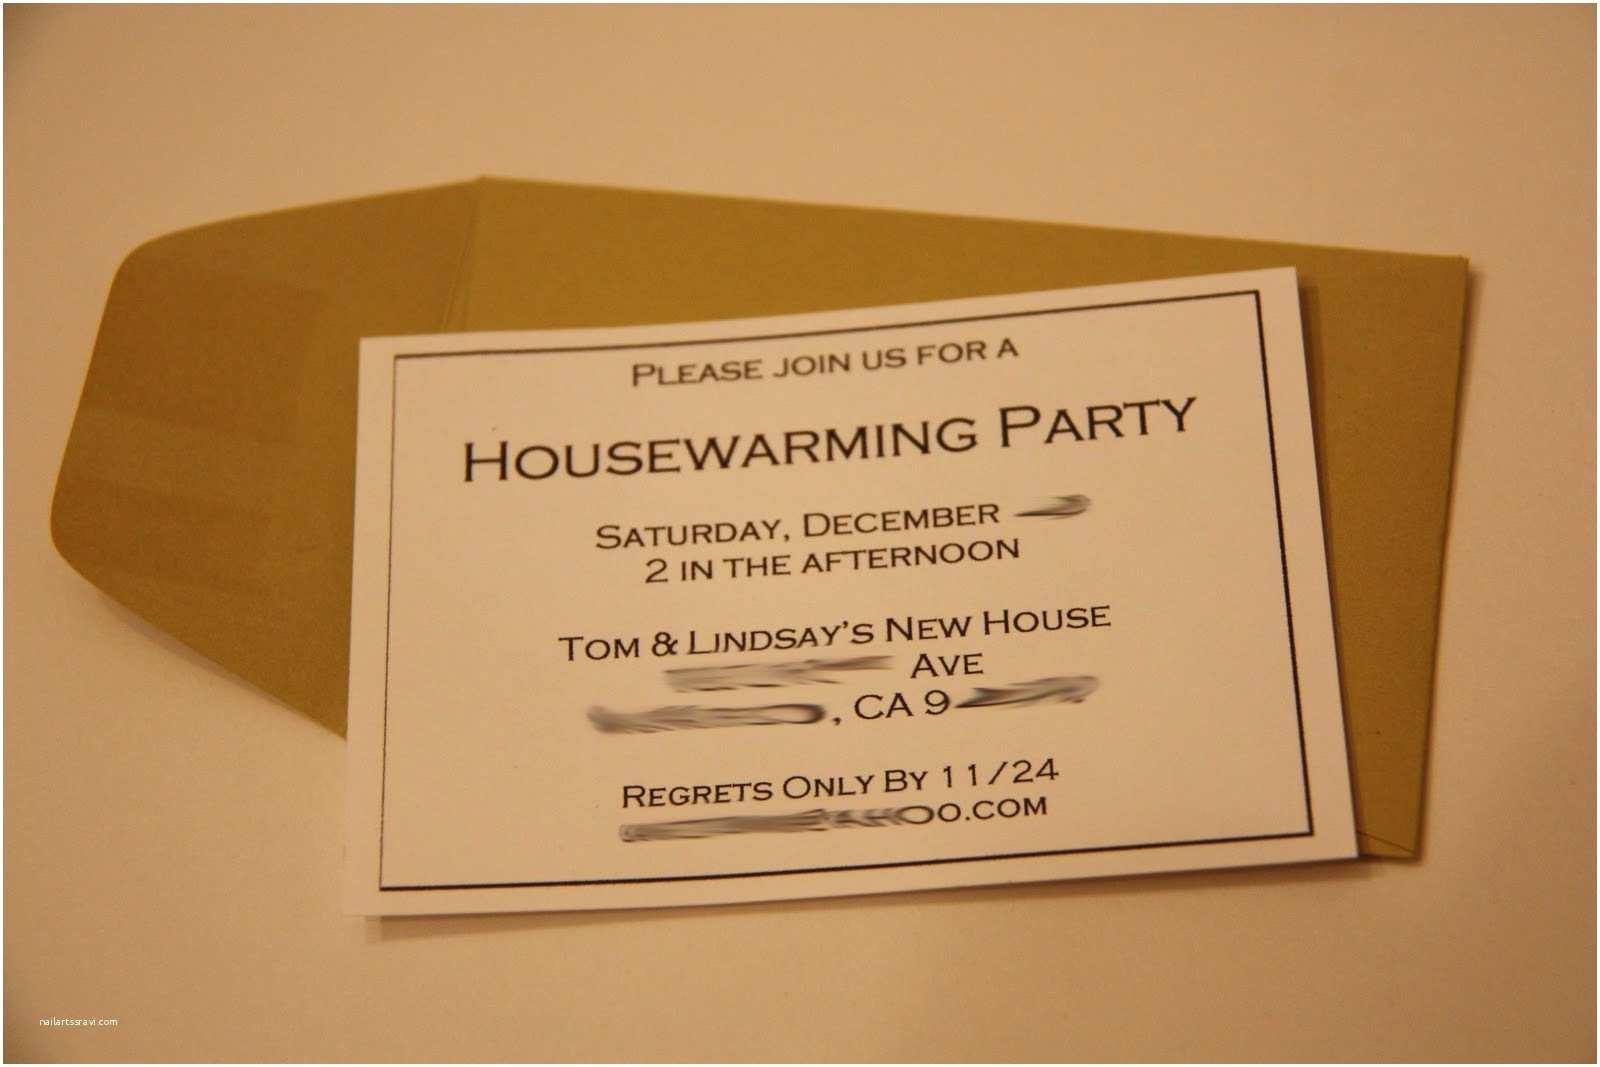 Housewarming Party Invitation Housewarming Party Invitations